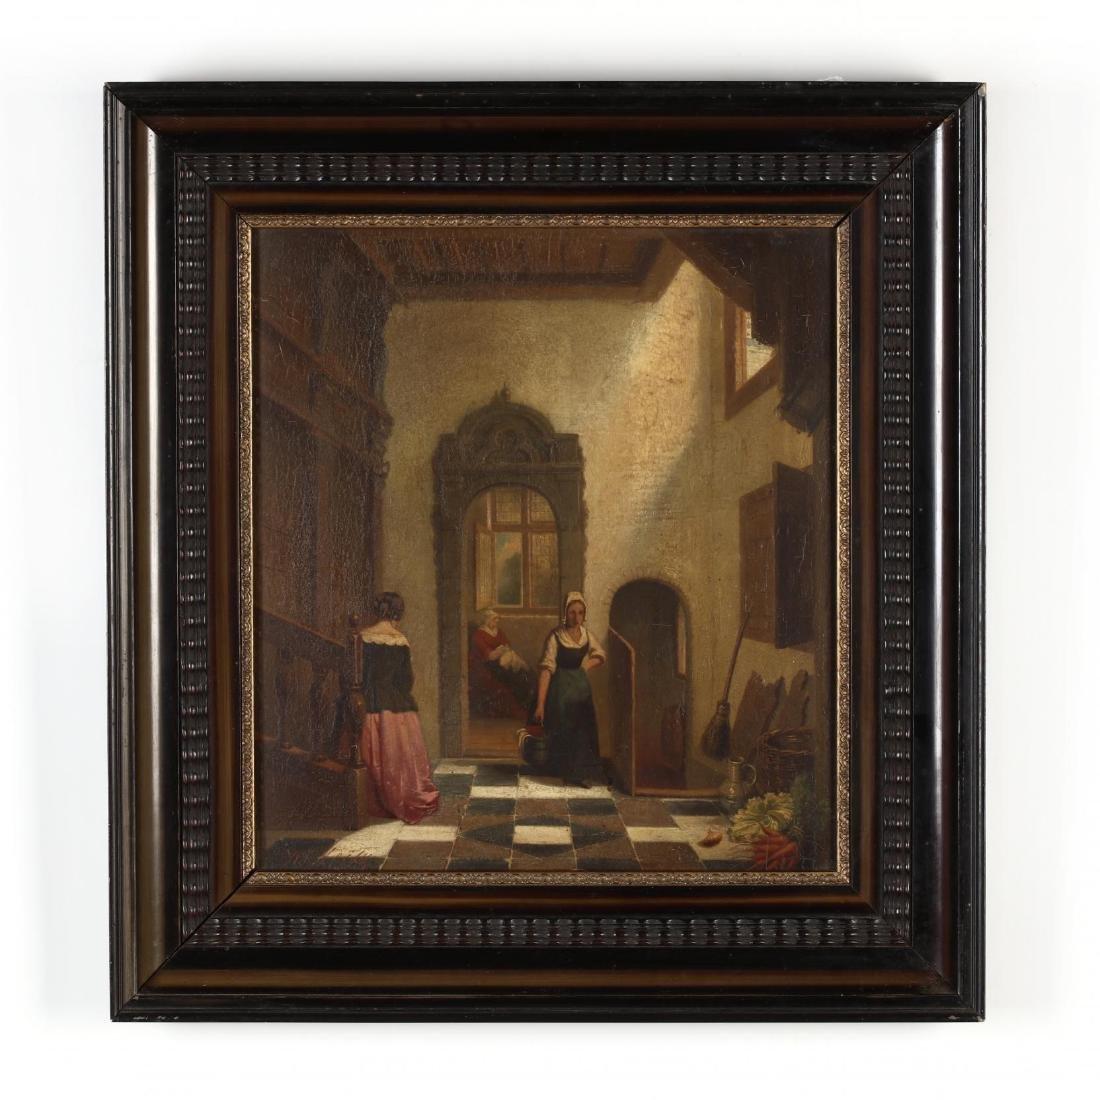 An Antique Dutch Interior Genre Painting